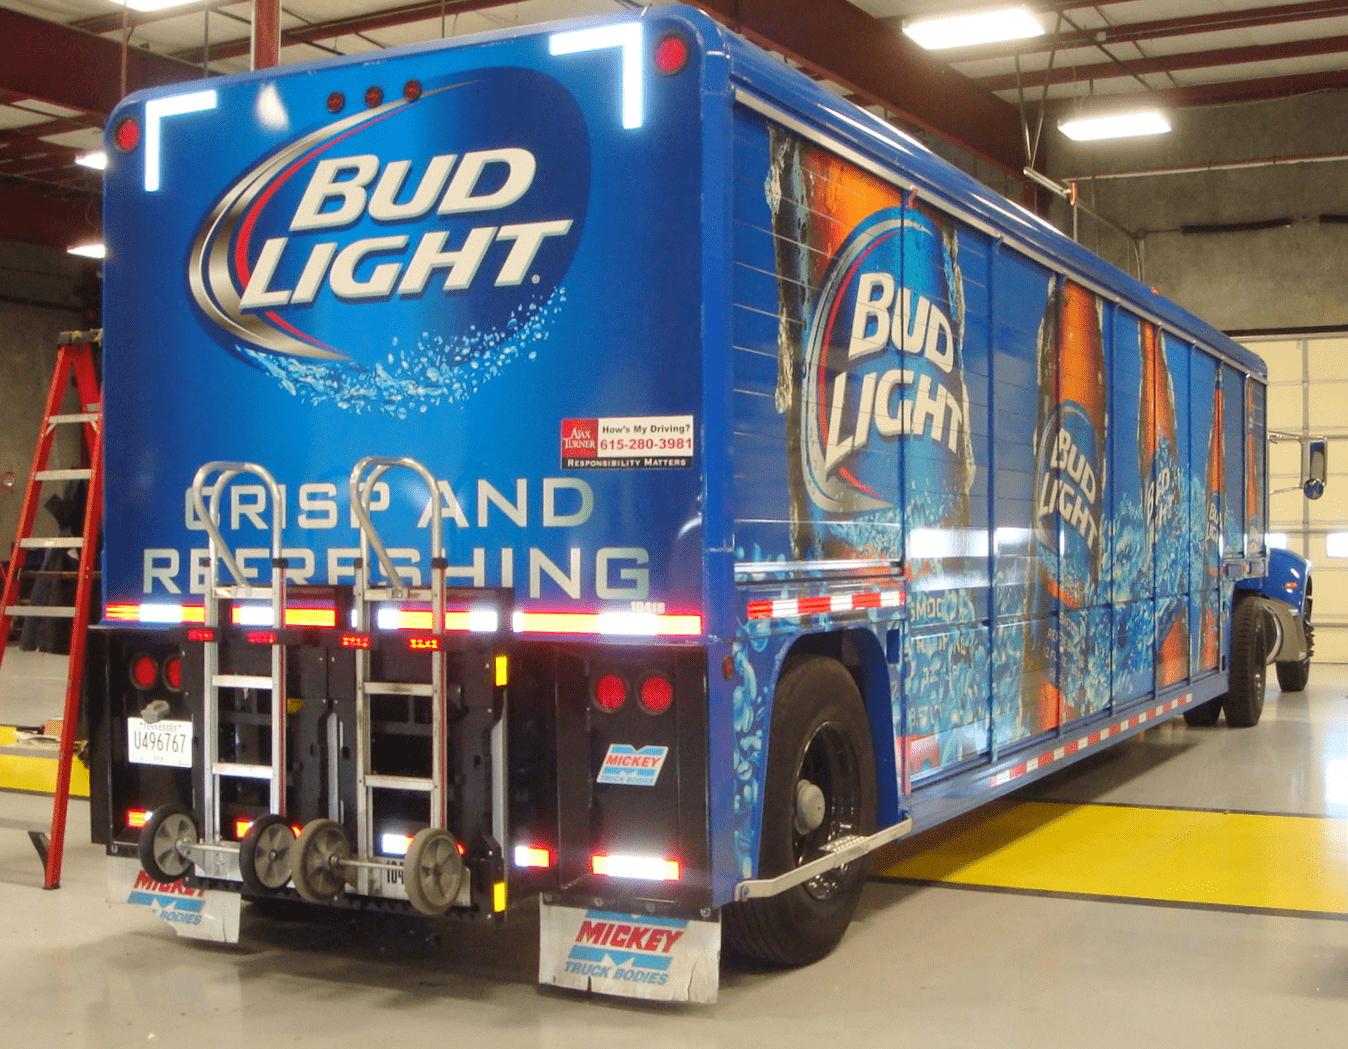 Bug Light Free Beer - Guerilla Marketing Examples